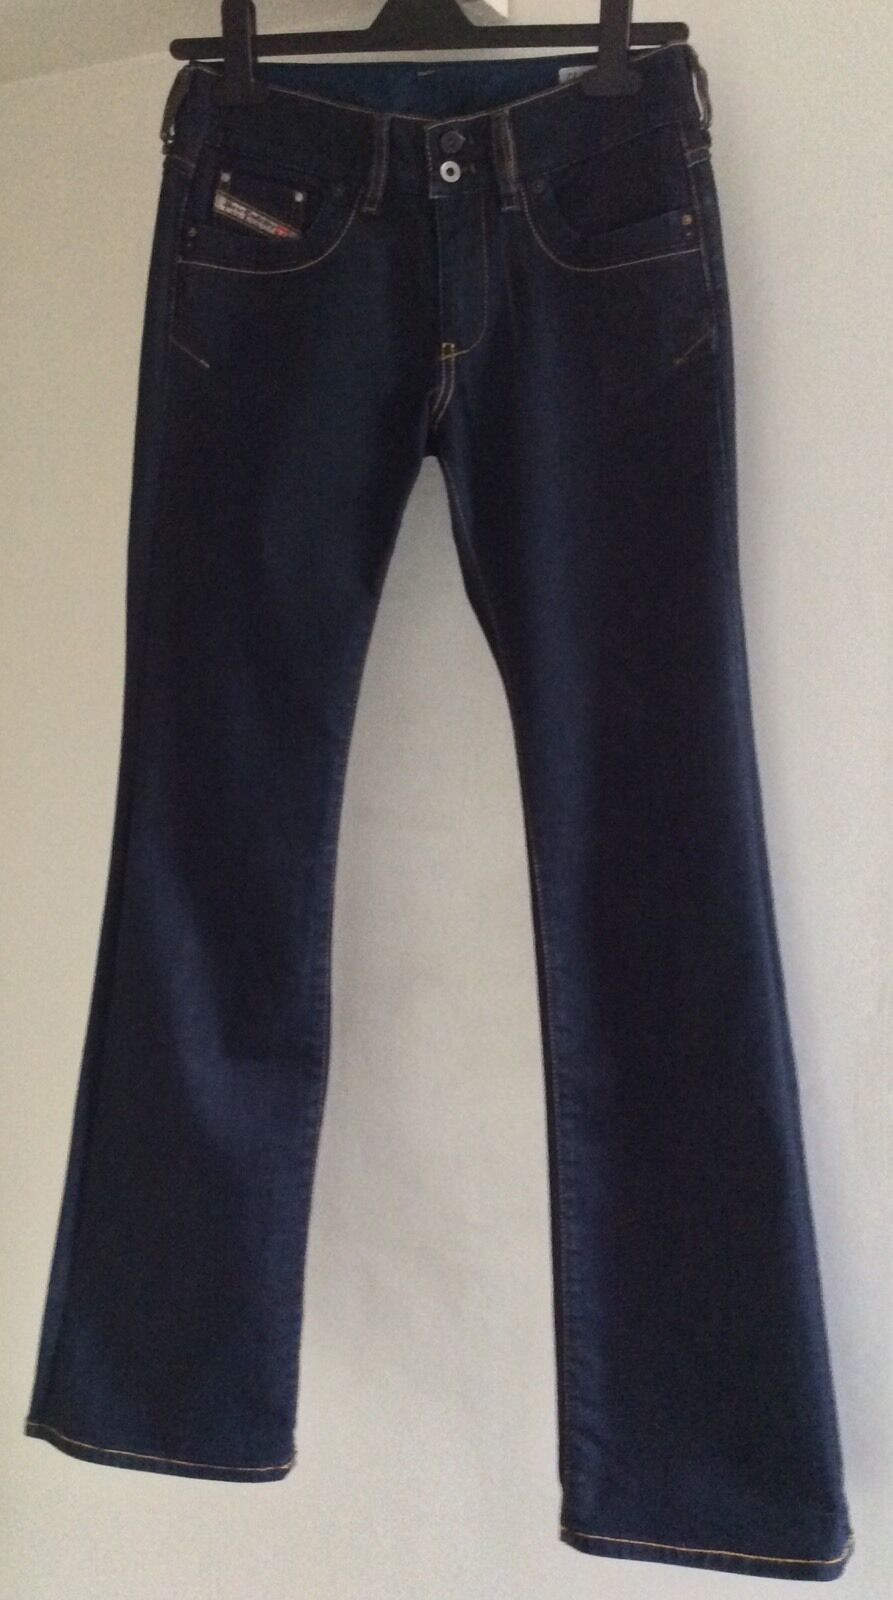 official photos 58956 fa1d0 Blu Scuro Diesel Ronhar 008AA avviocut Donna Jeans Jeans ...